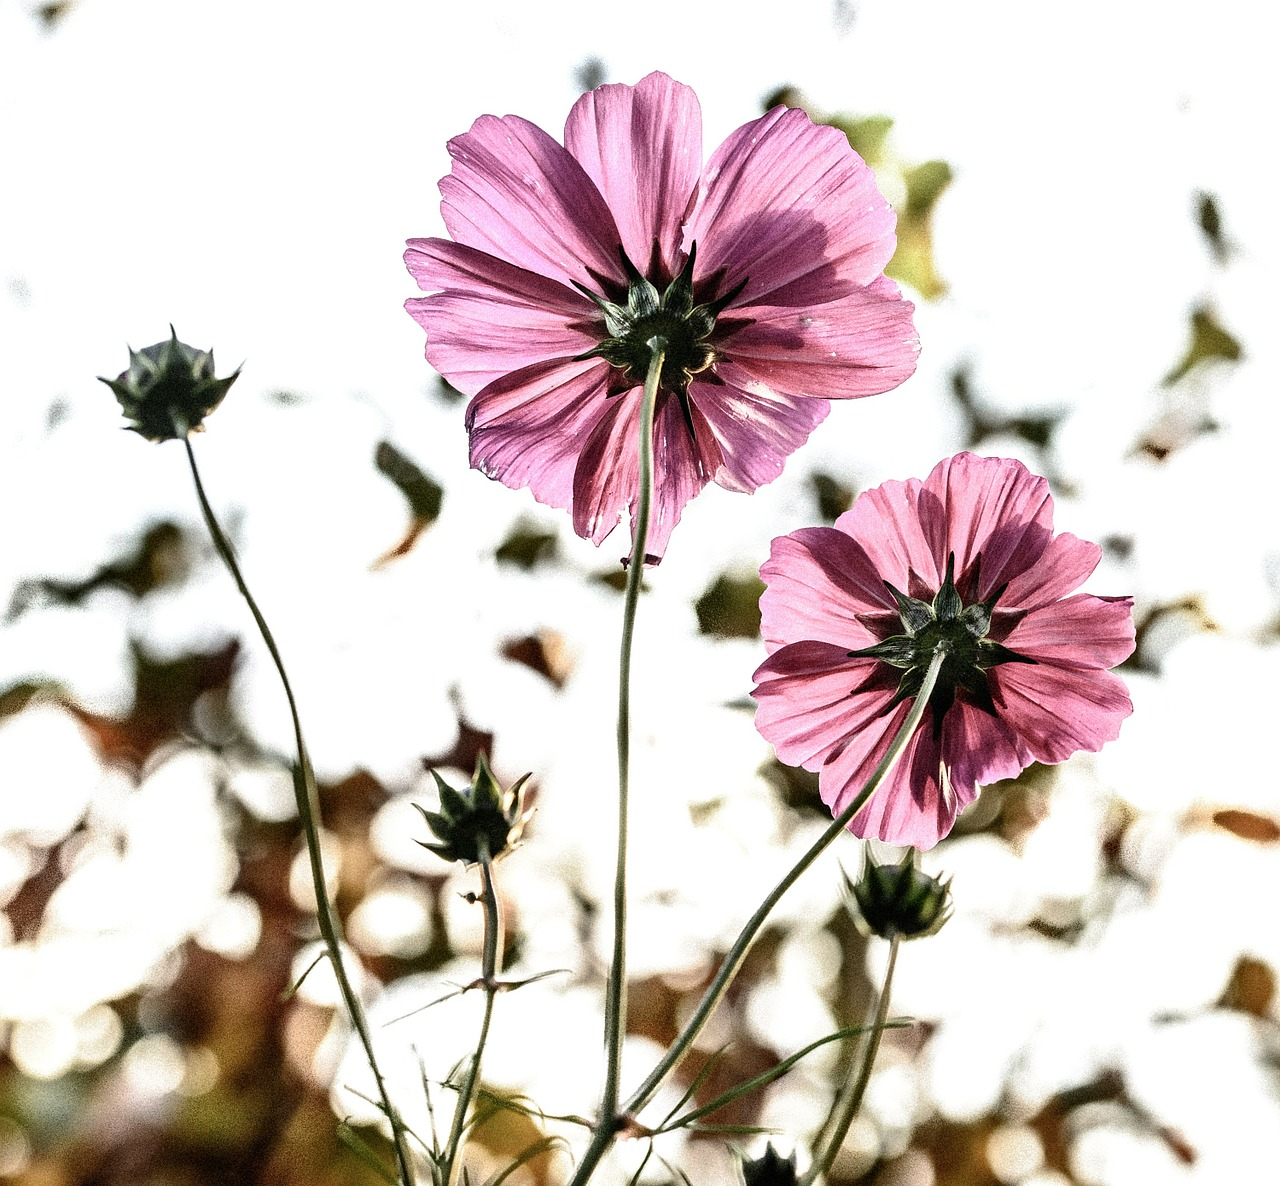 flowers-209144_1280